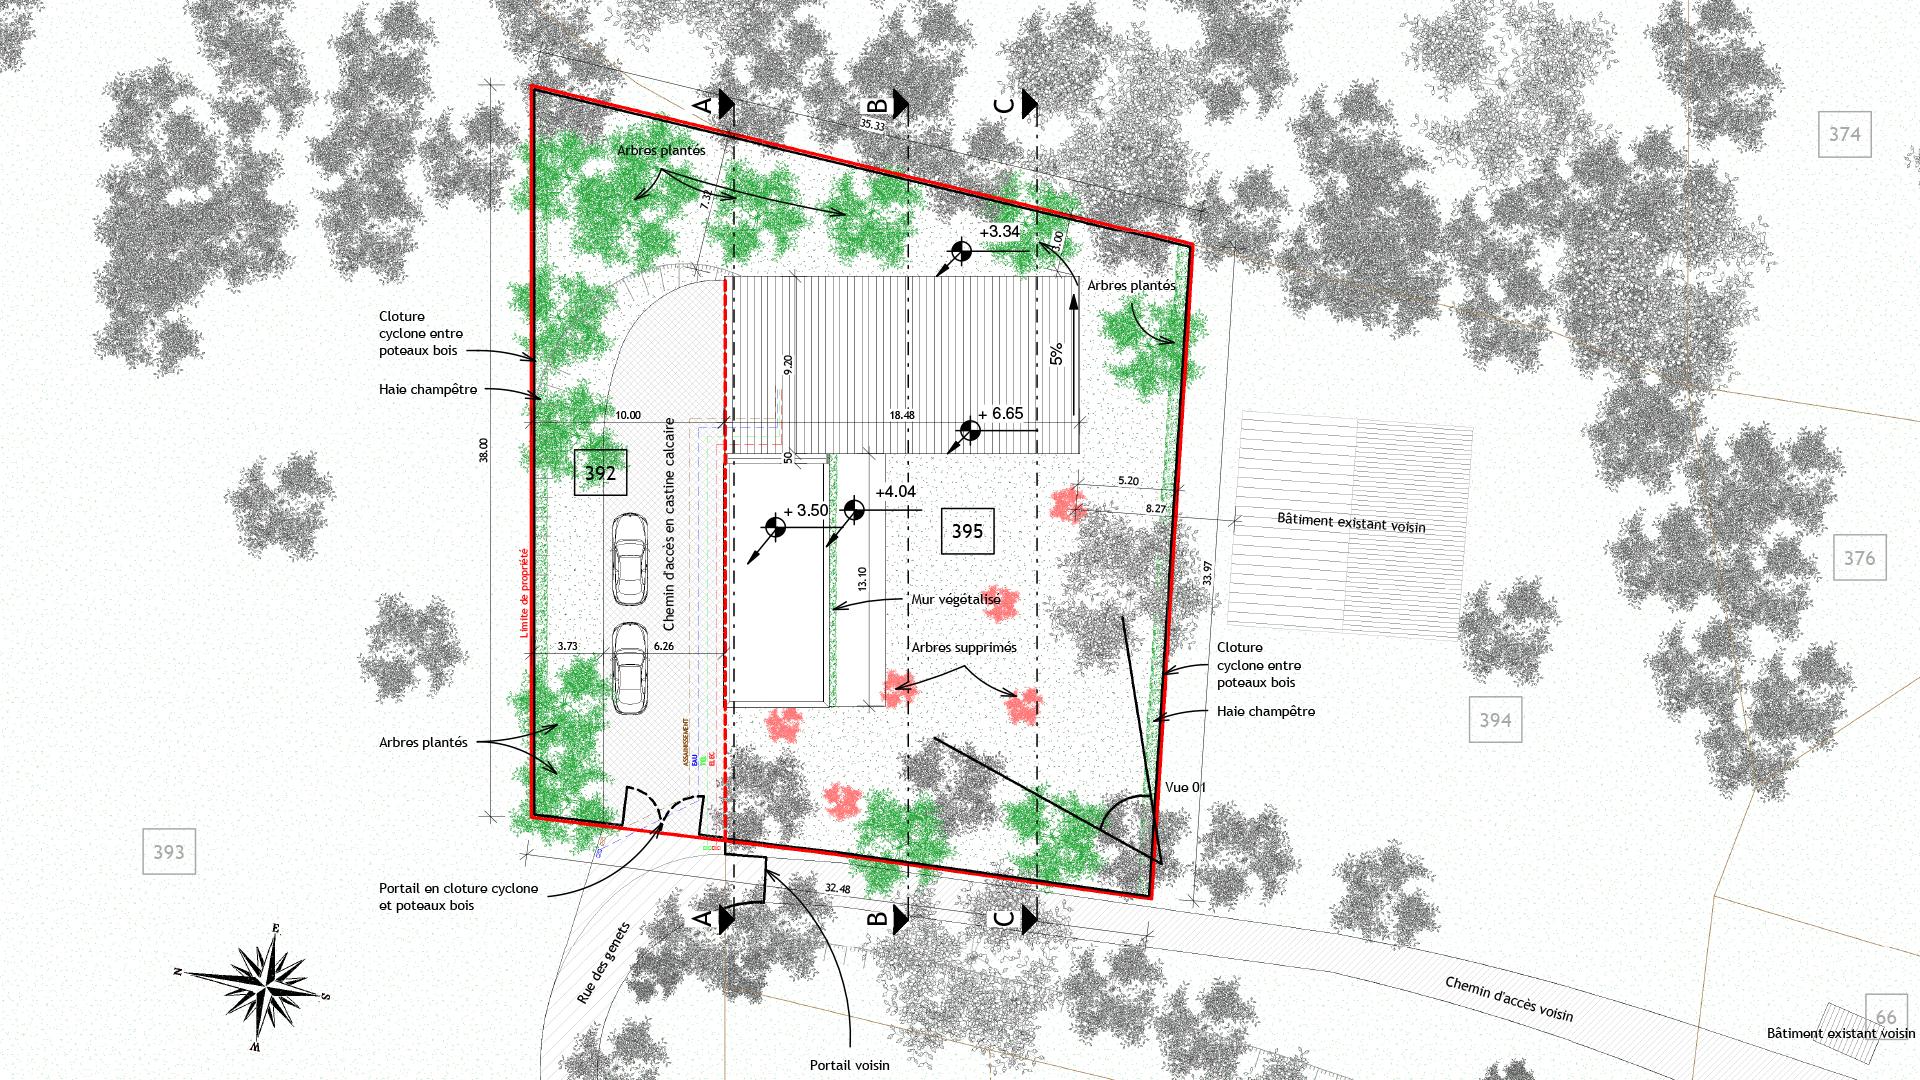 2018-07_Belpech_Maison_Plan-masse_Jeremy-Garcia